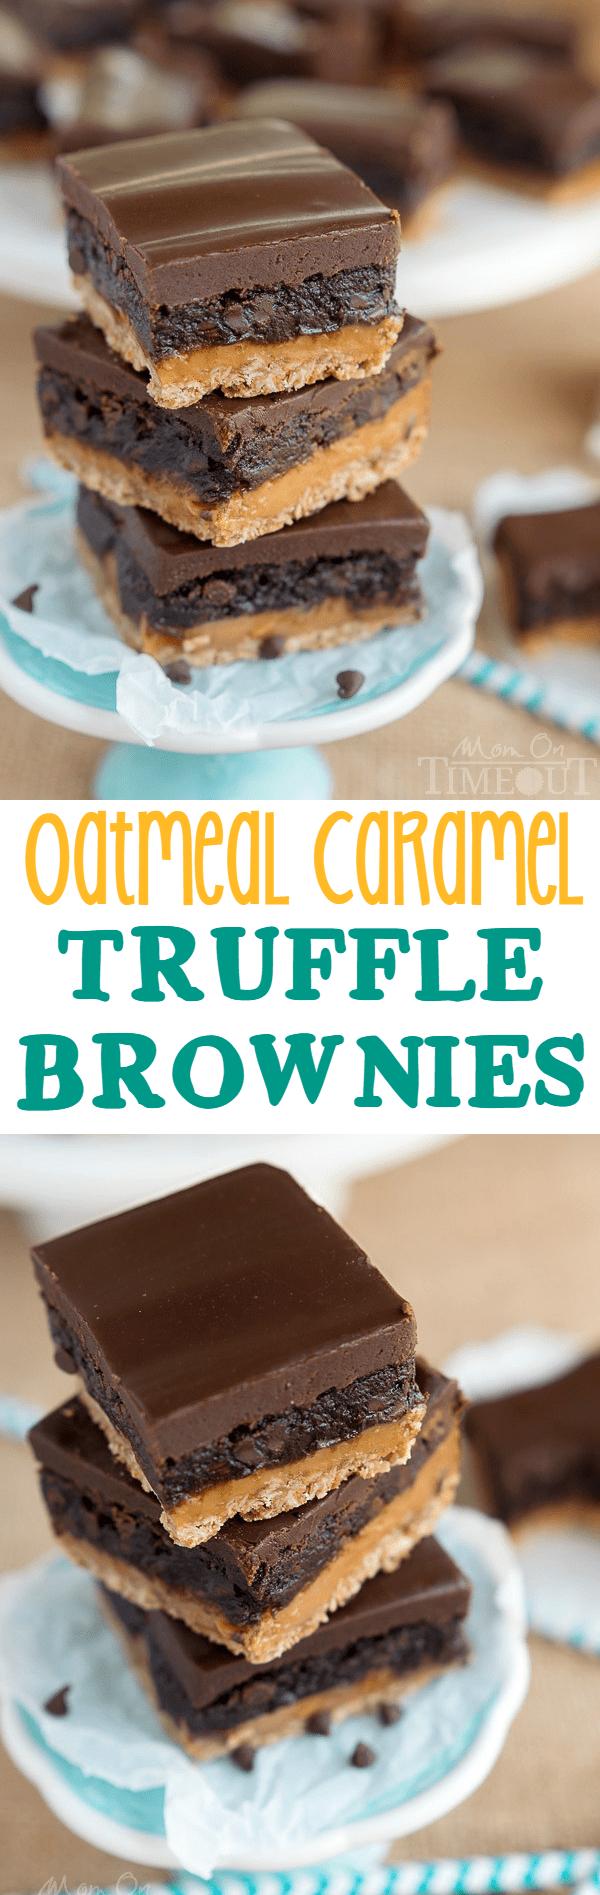 Oatmeal Caramel Truffle Brownies - Mom On Timeout